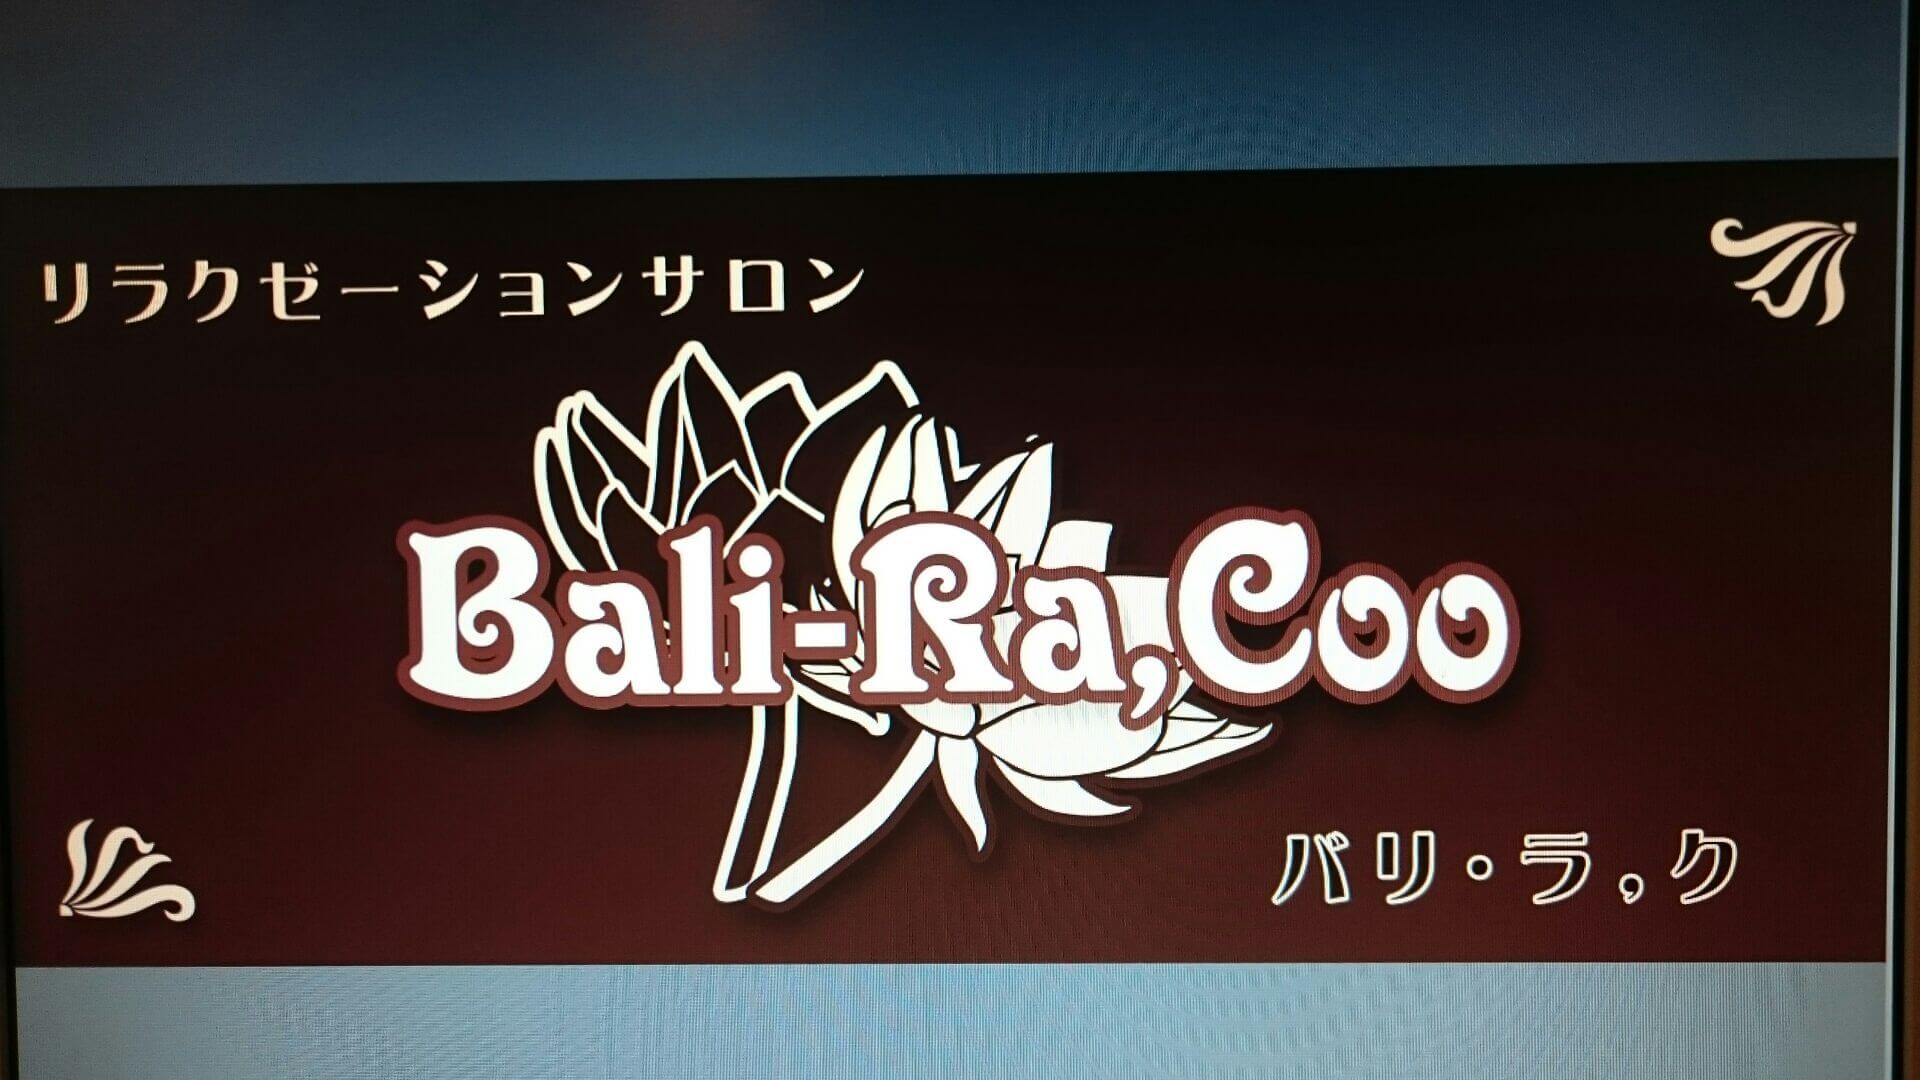 -Bali-Ra,Coo-とは?